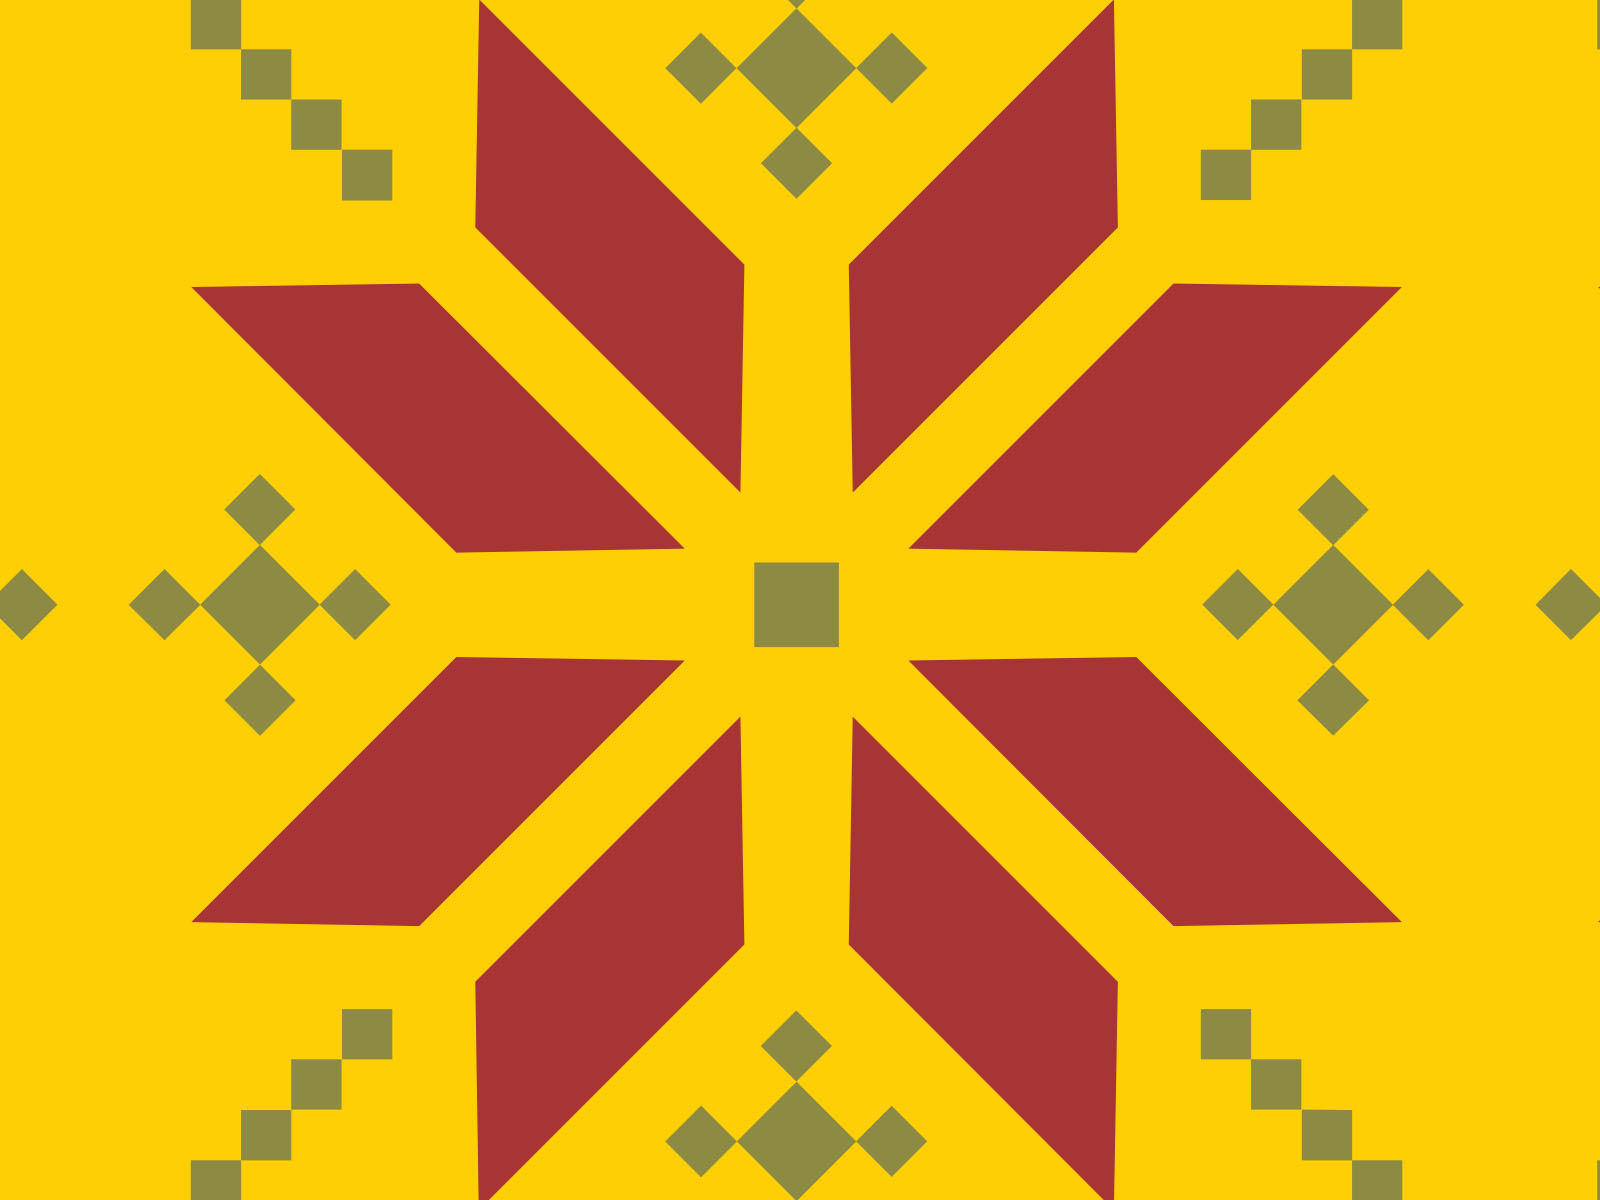 Hexagon Pattern Powerpoint Backgrounds